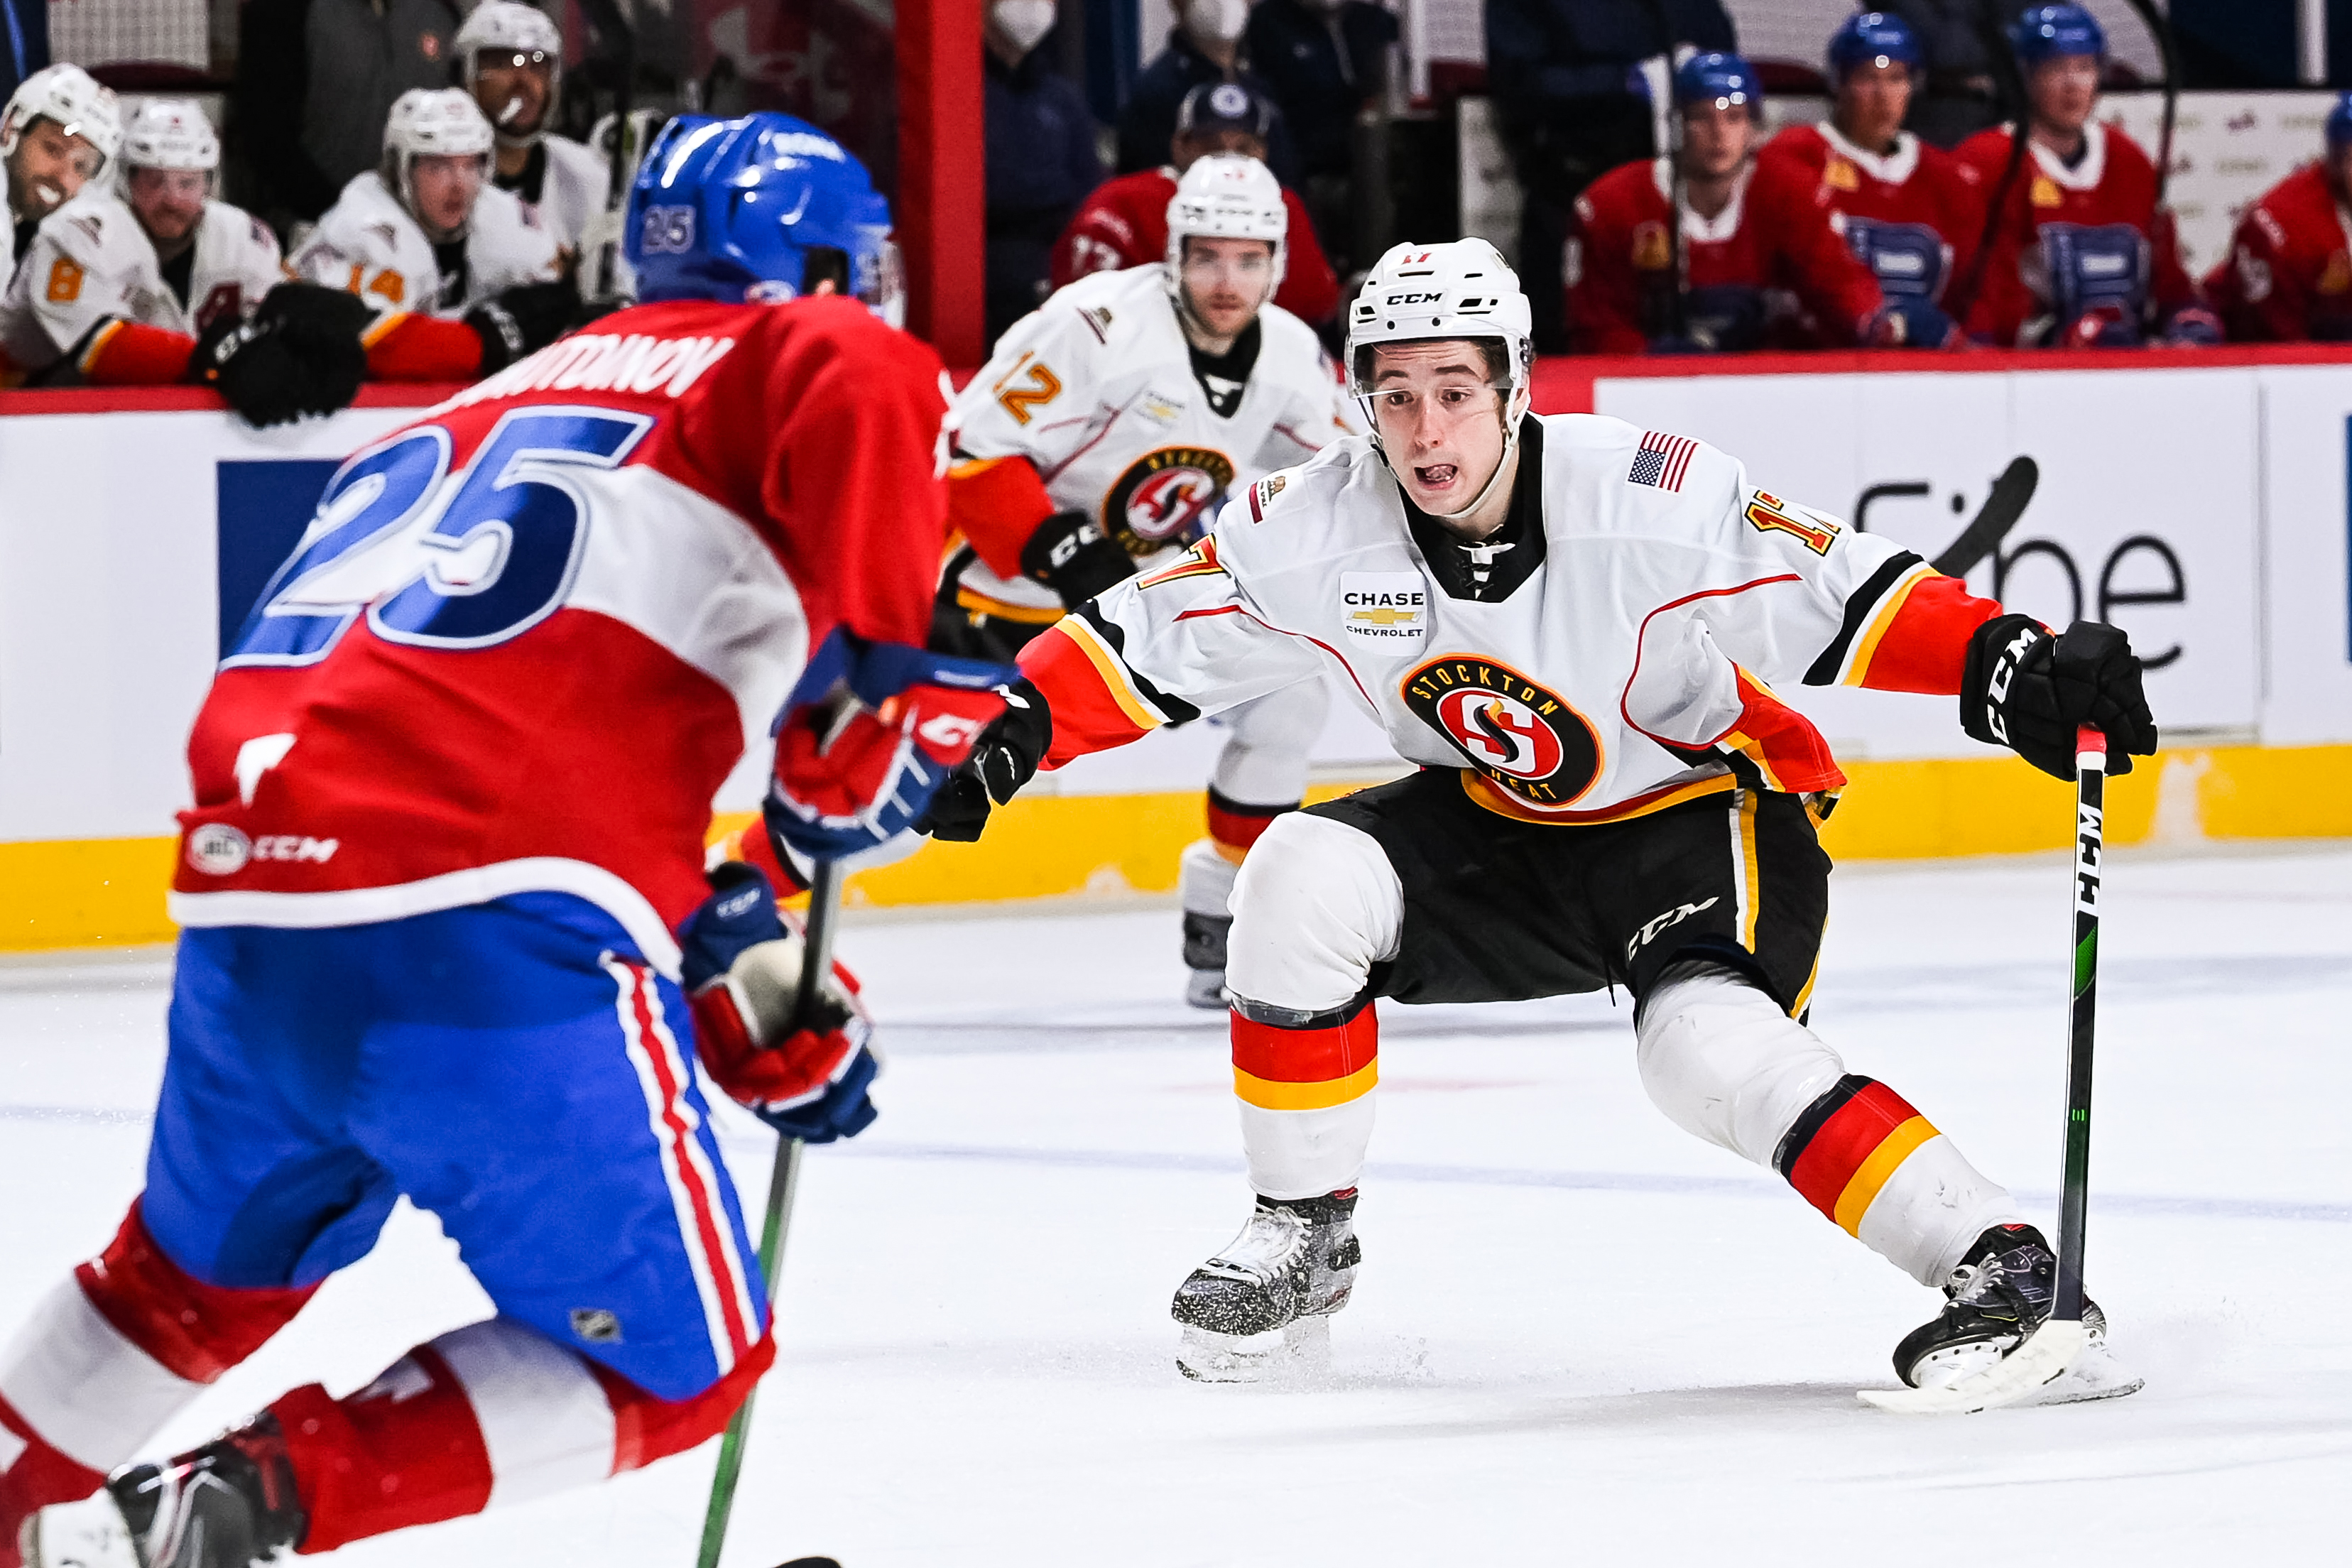 AHL: APR 04 Stockton Heat at Laval Rocket